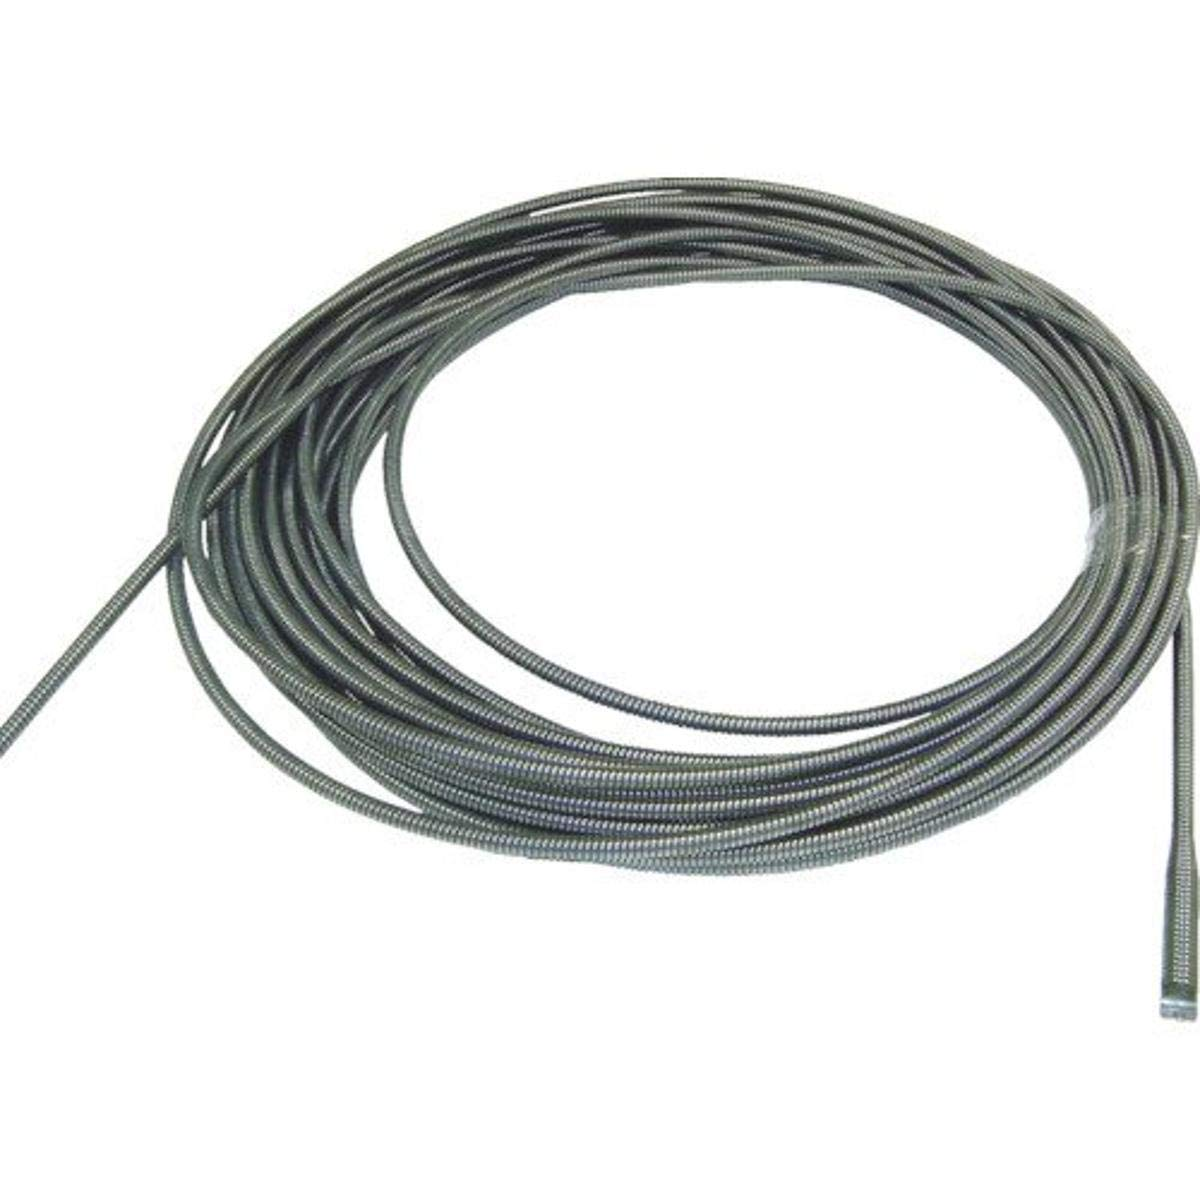 "Ridgid 37847 C-32 3/8"" x 75' Inner Core Cable , Gray"